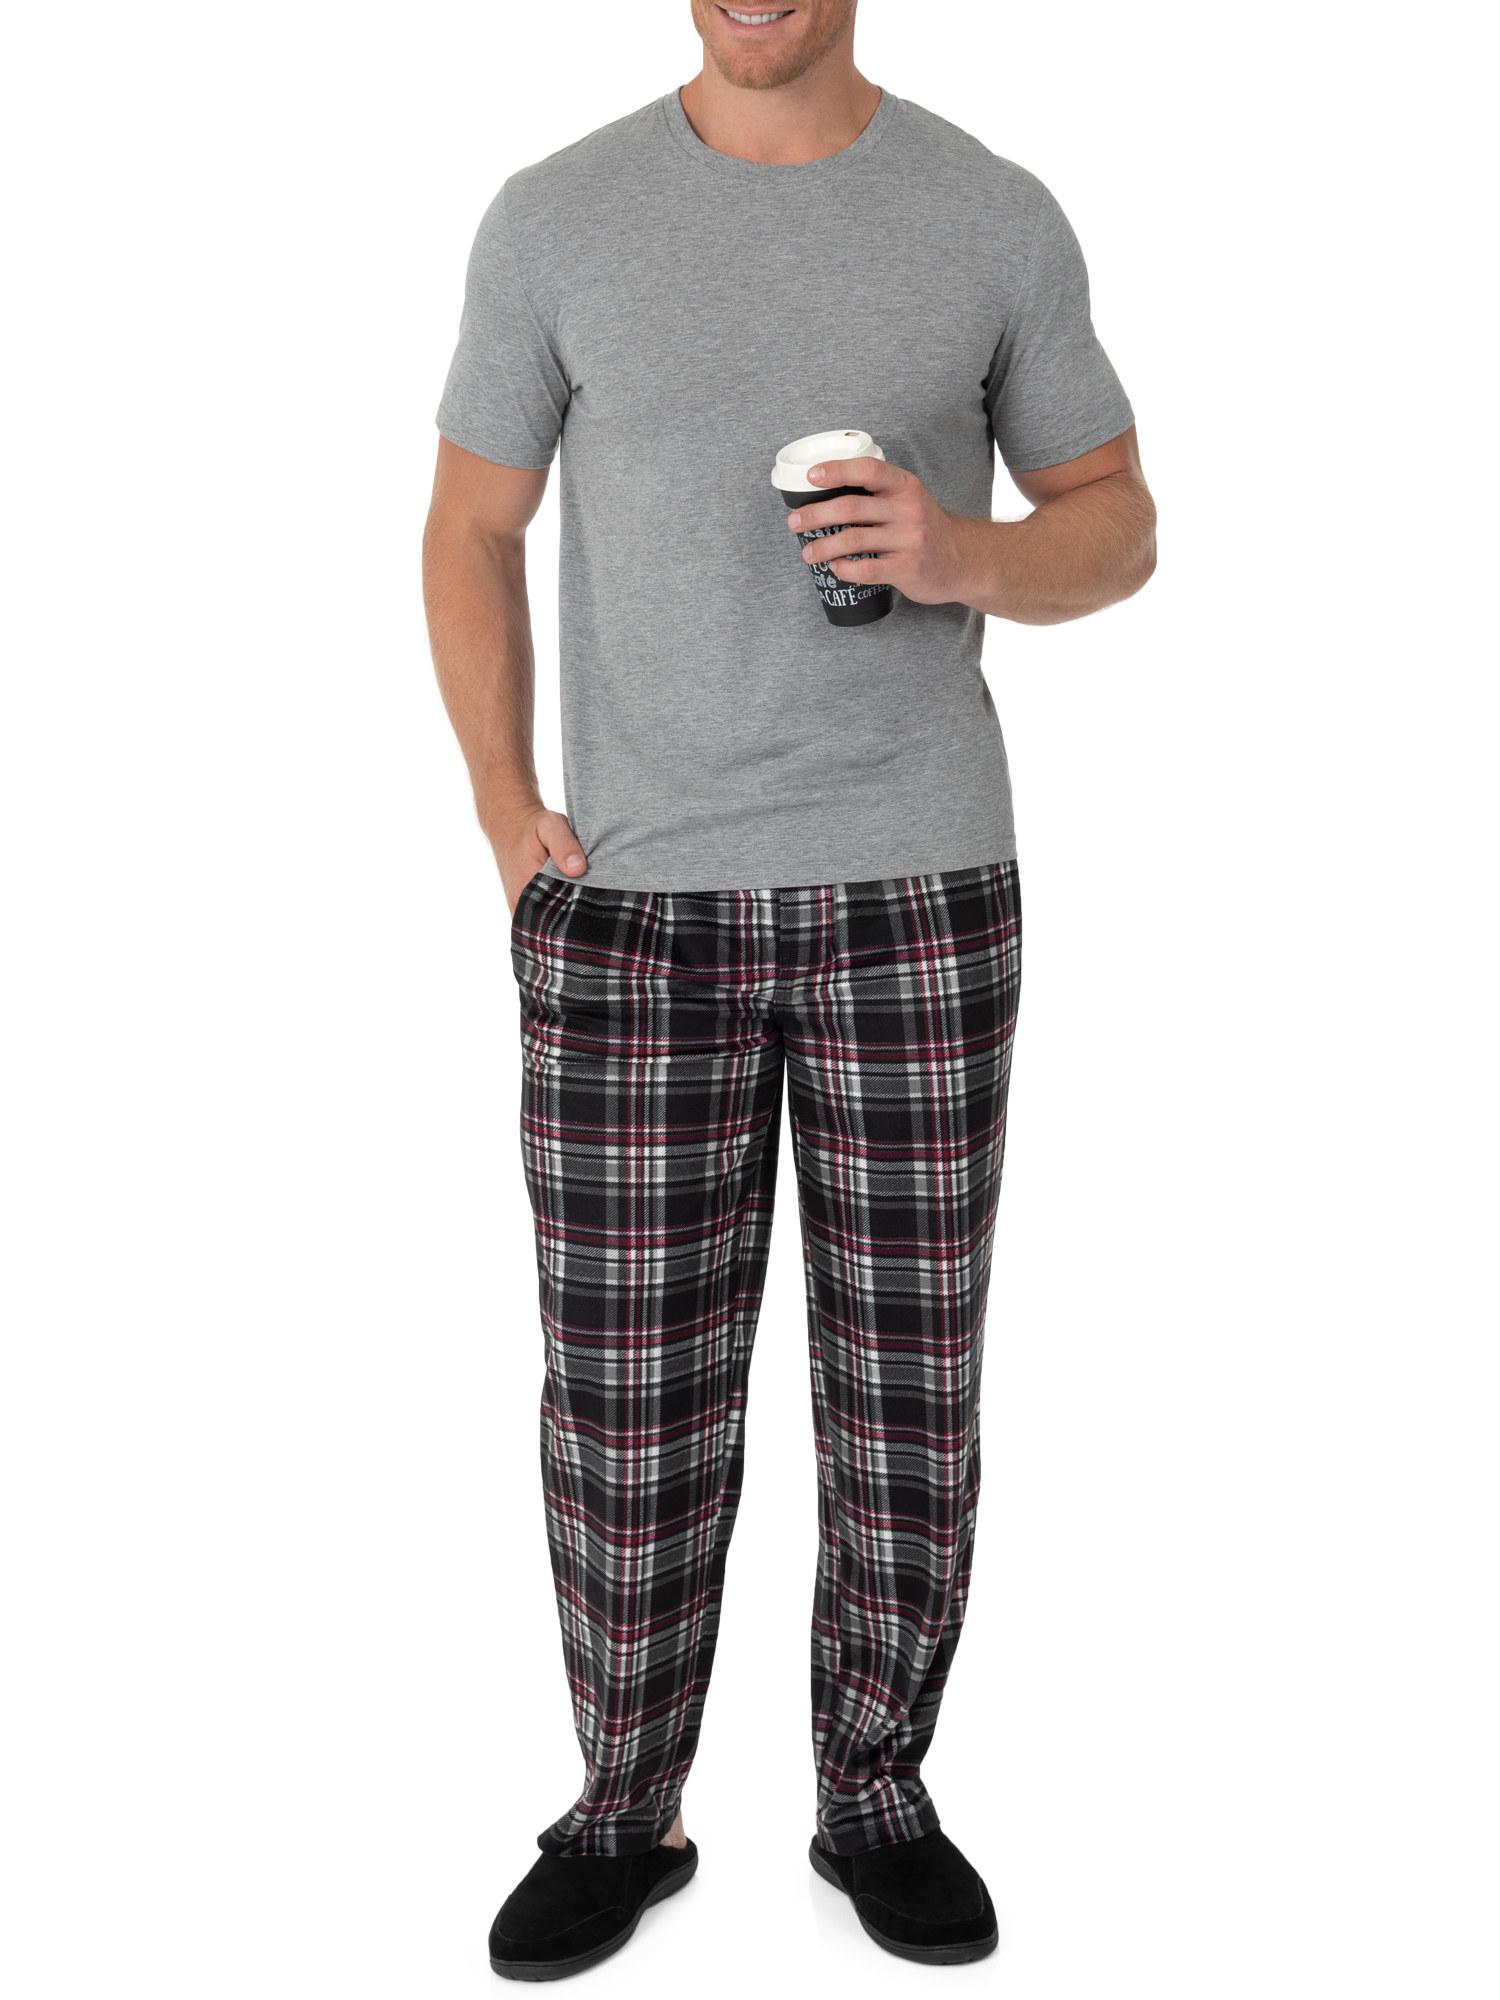 The black and red plaid pajama pants